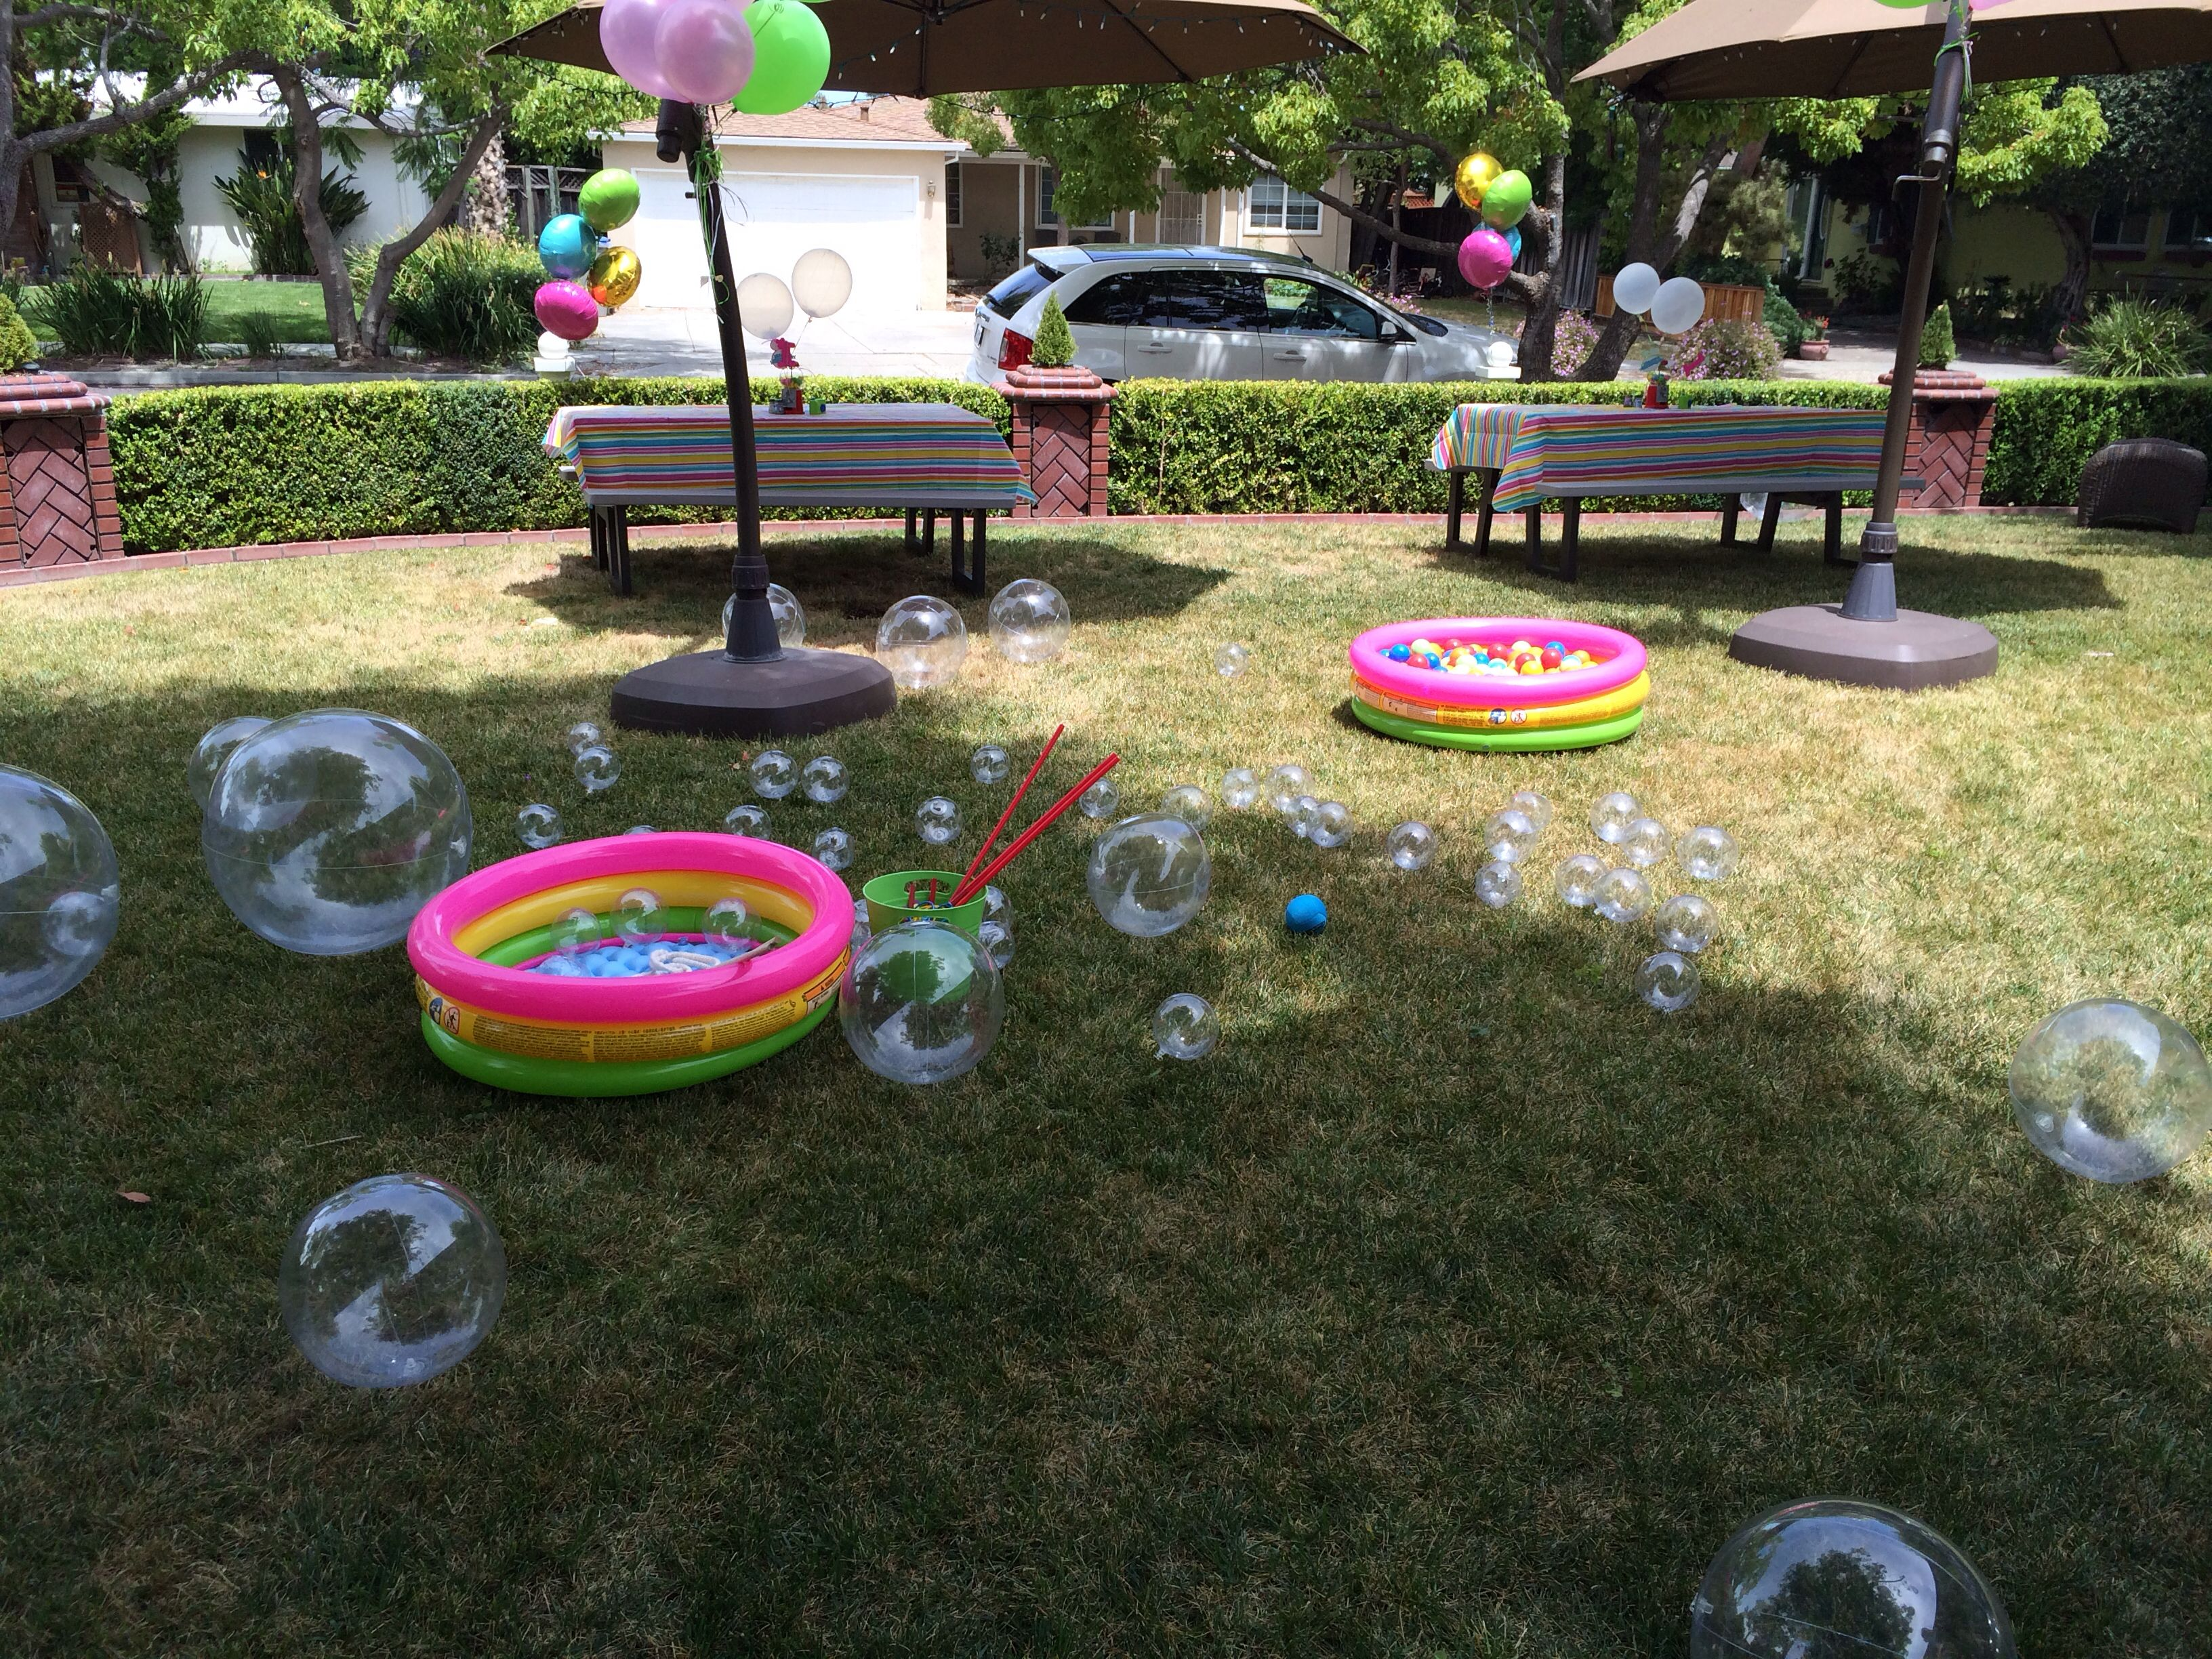 bubble party activities u0026 decor kiddie pools ball pit balls